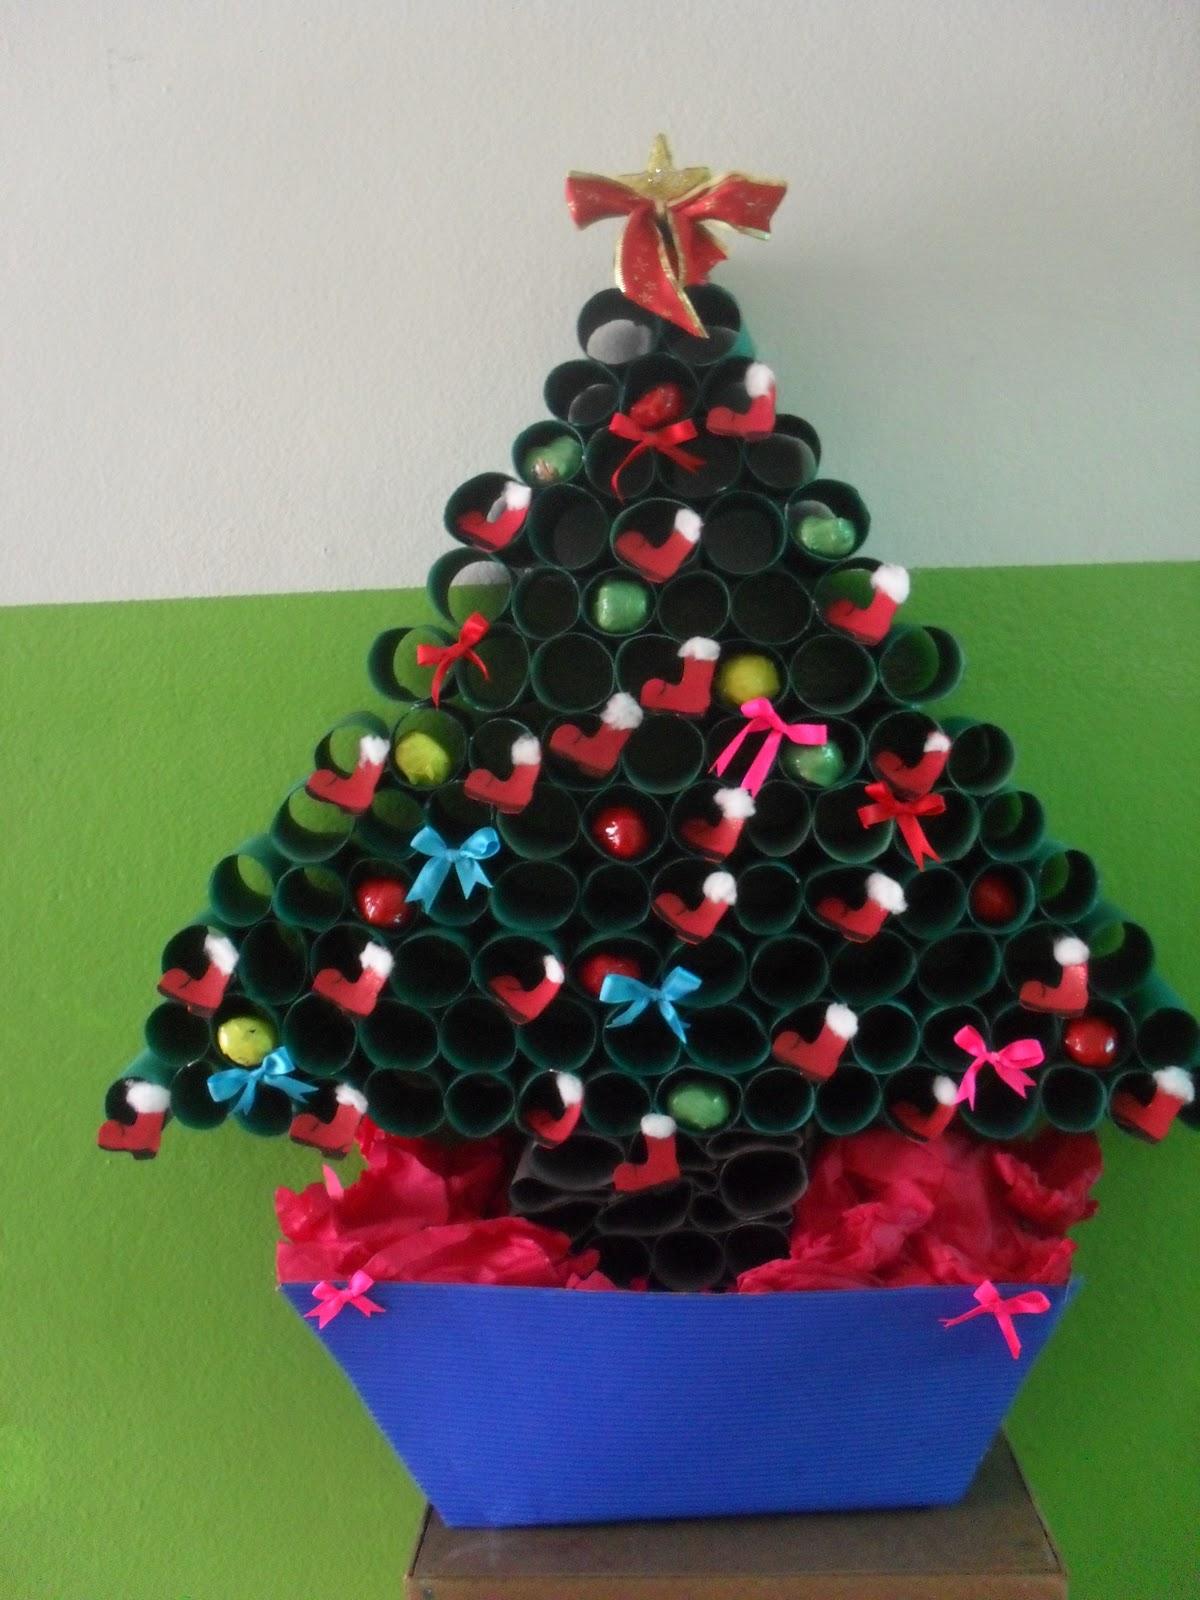 decoracao arvore de natal reciclavel : decoracao arvore de natal reciclavel:Essa foi feita com rolos de papel higiênico pintados de verde.